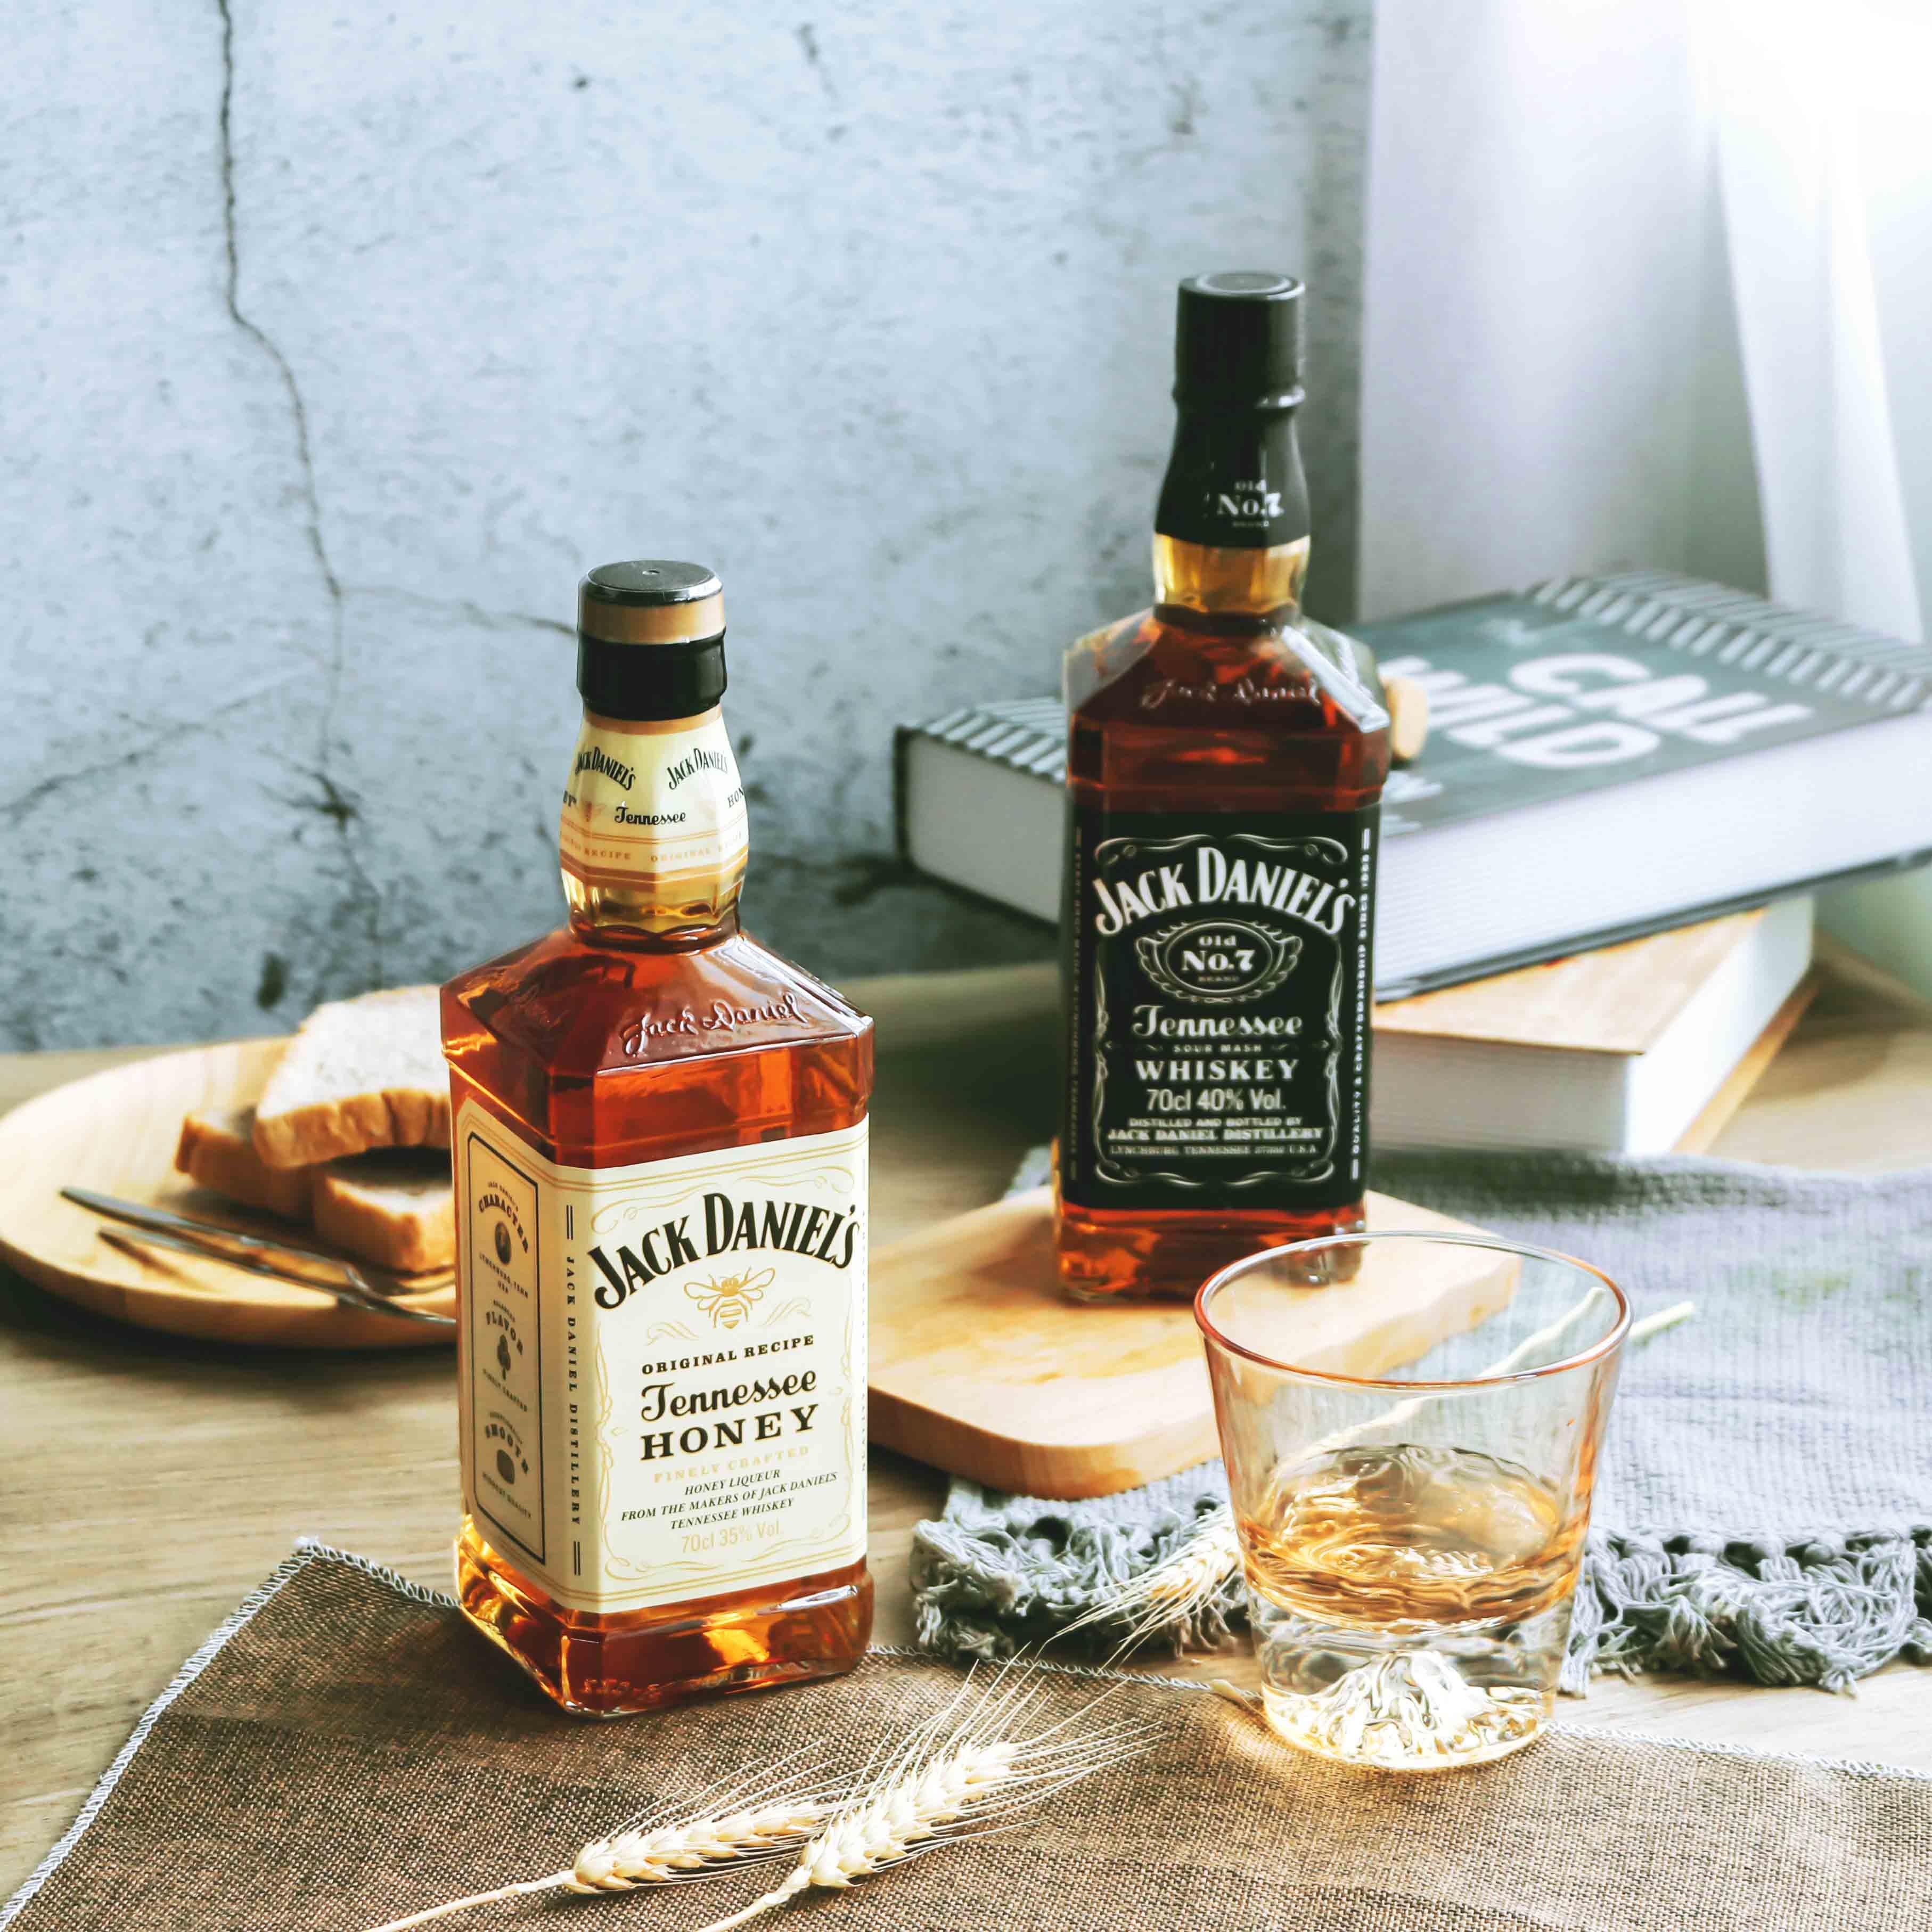 700ml 洋酒可乐桶威士忌酒 行货丨杰克丹尼美国 原味 JackDaniels